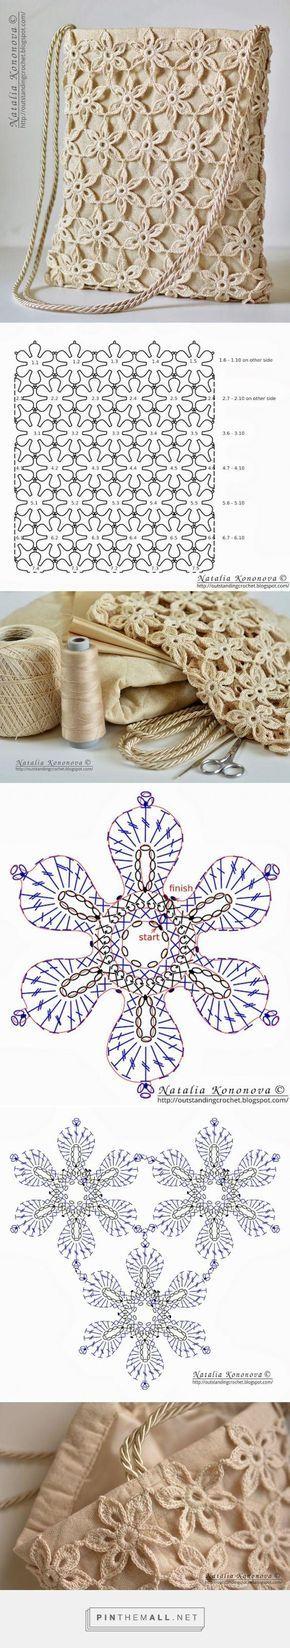 64 best el işleri images on Pinterest | Stitching, Hand crafts and ...